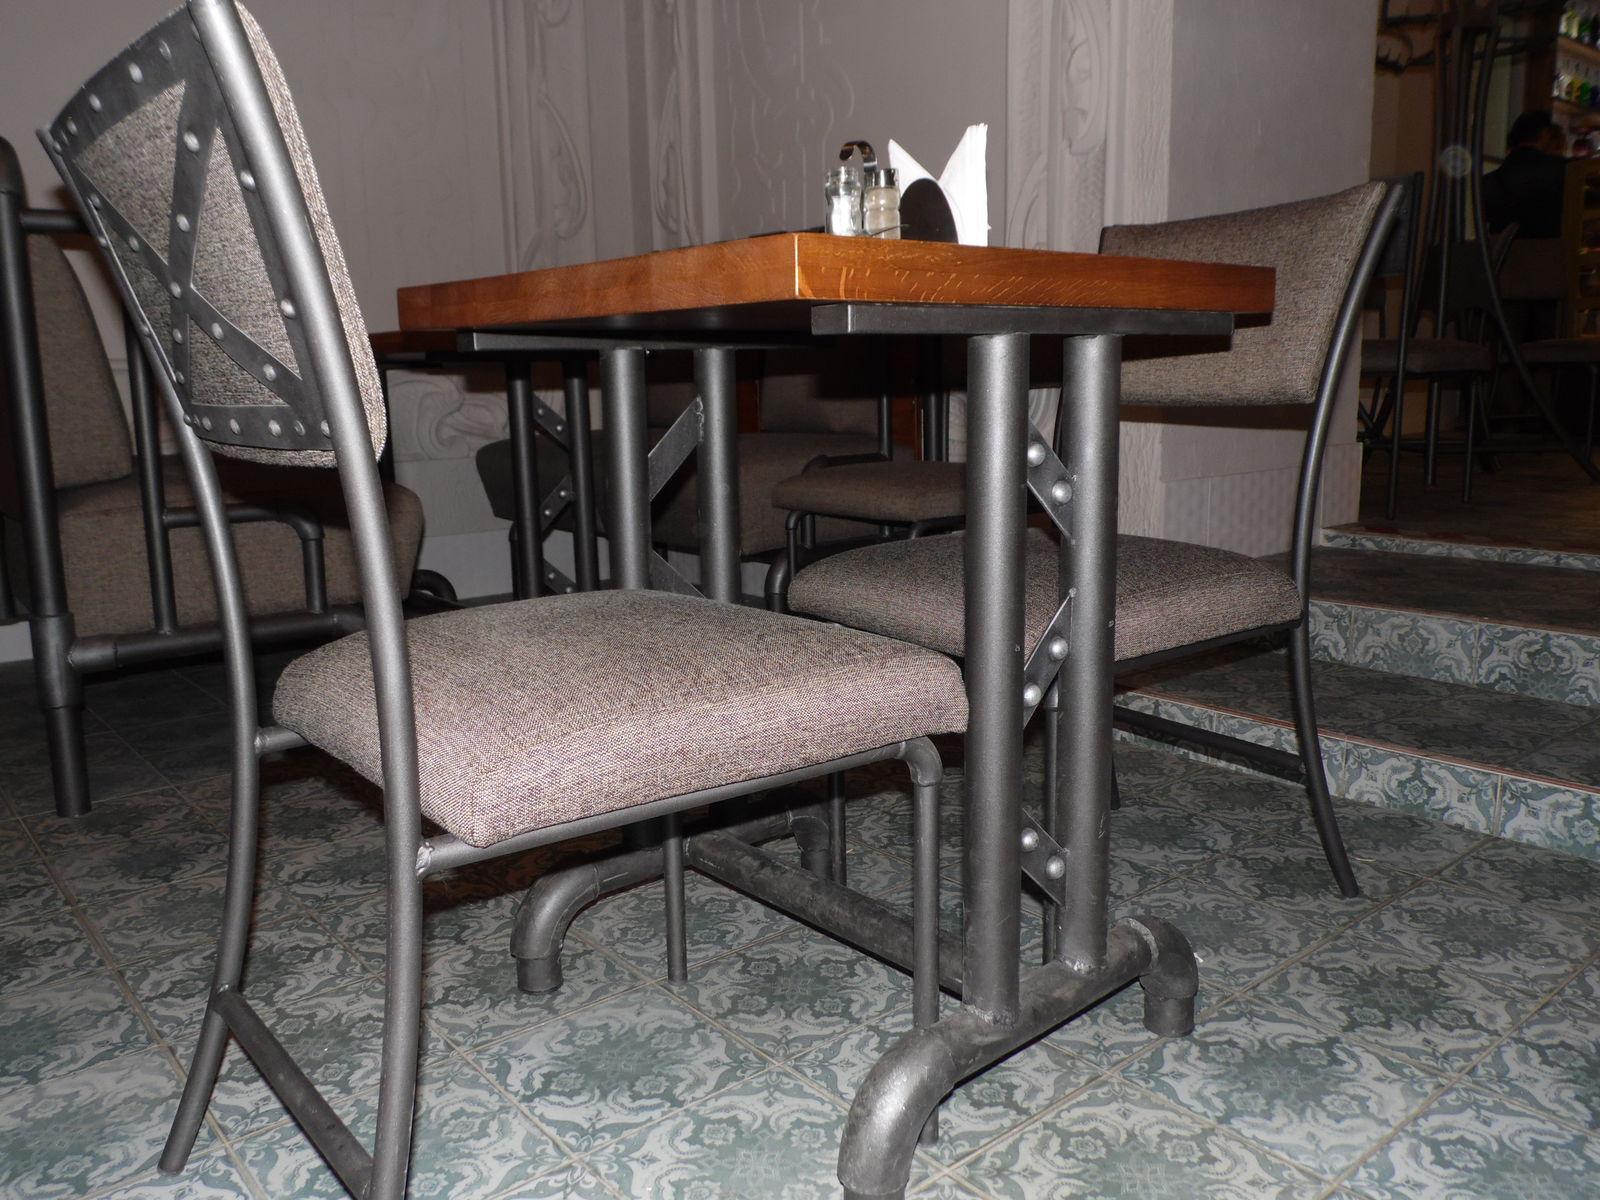 стул и стол, пиццерия